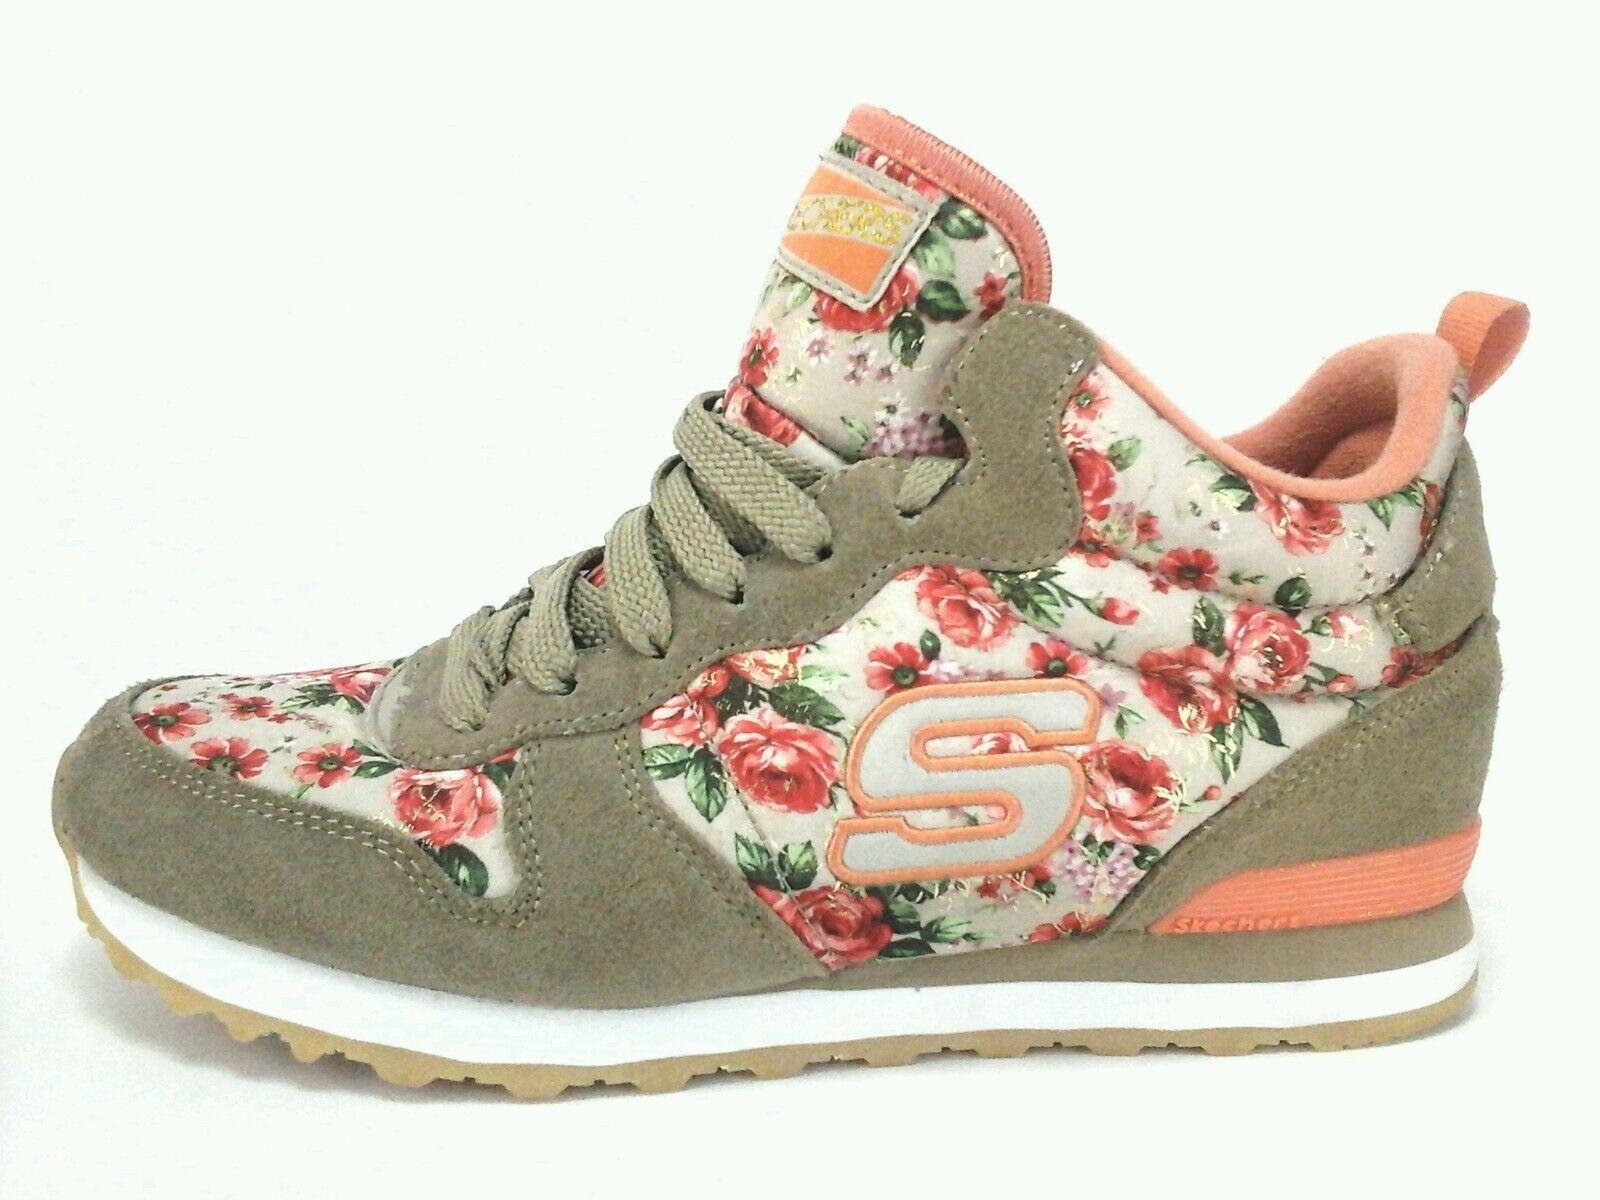 Women Shoes Skechers Memory Foam Air Cooled Roses Print US 10 EUC